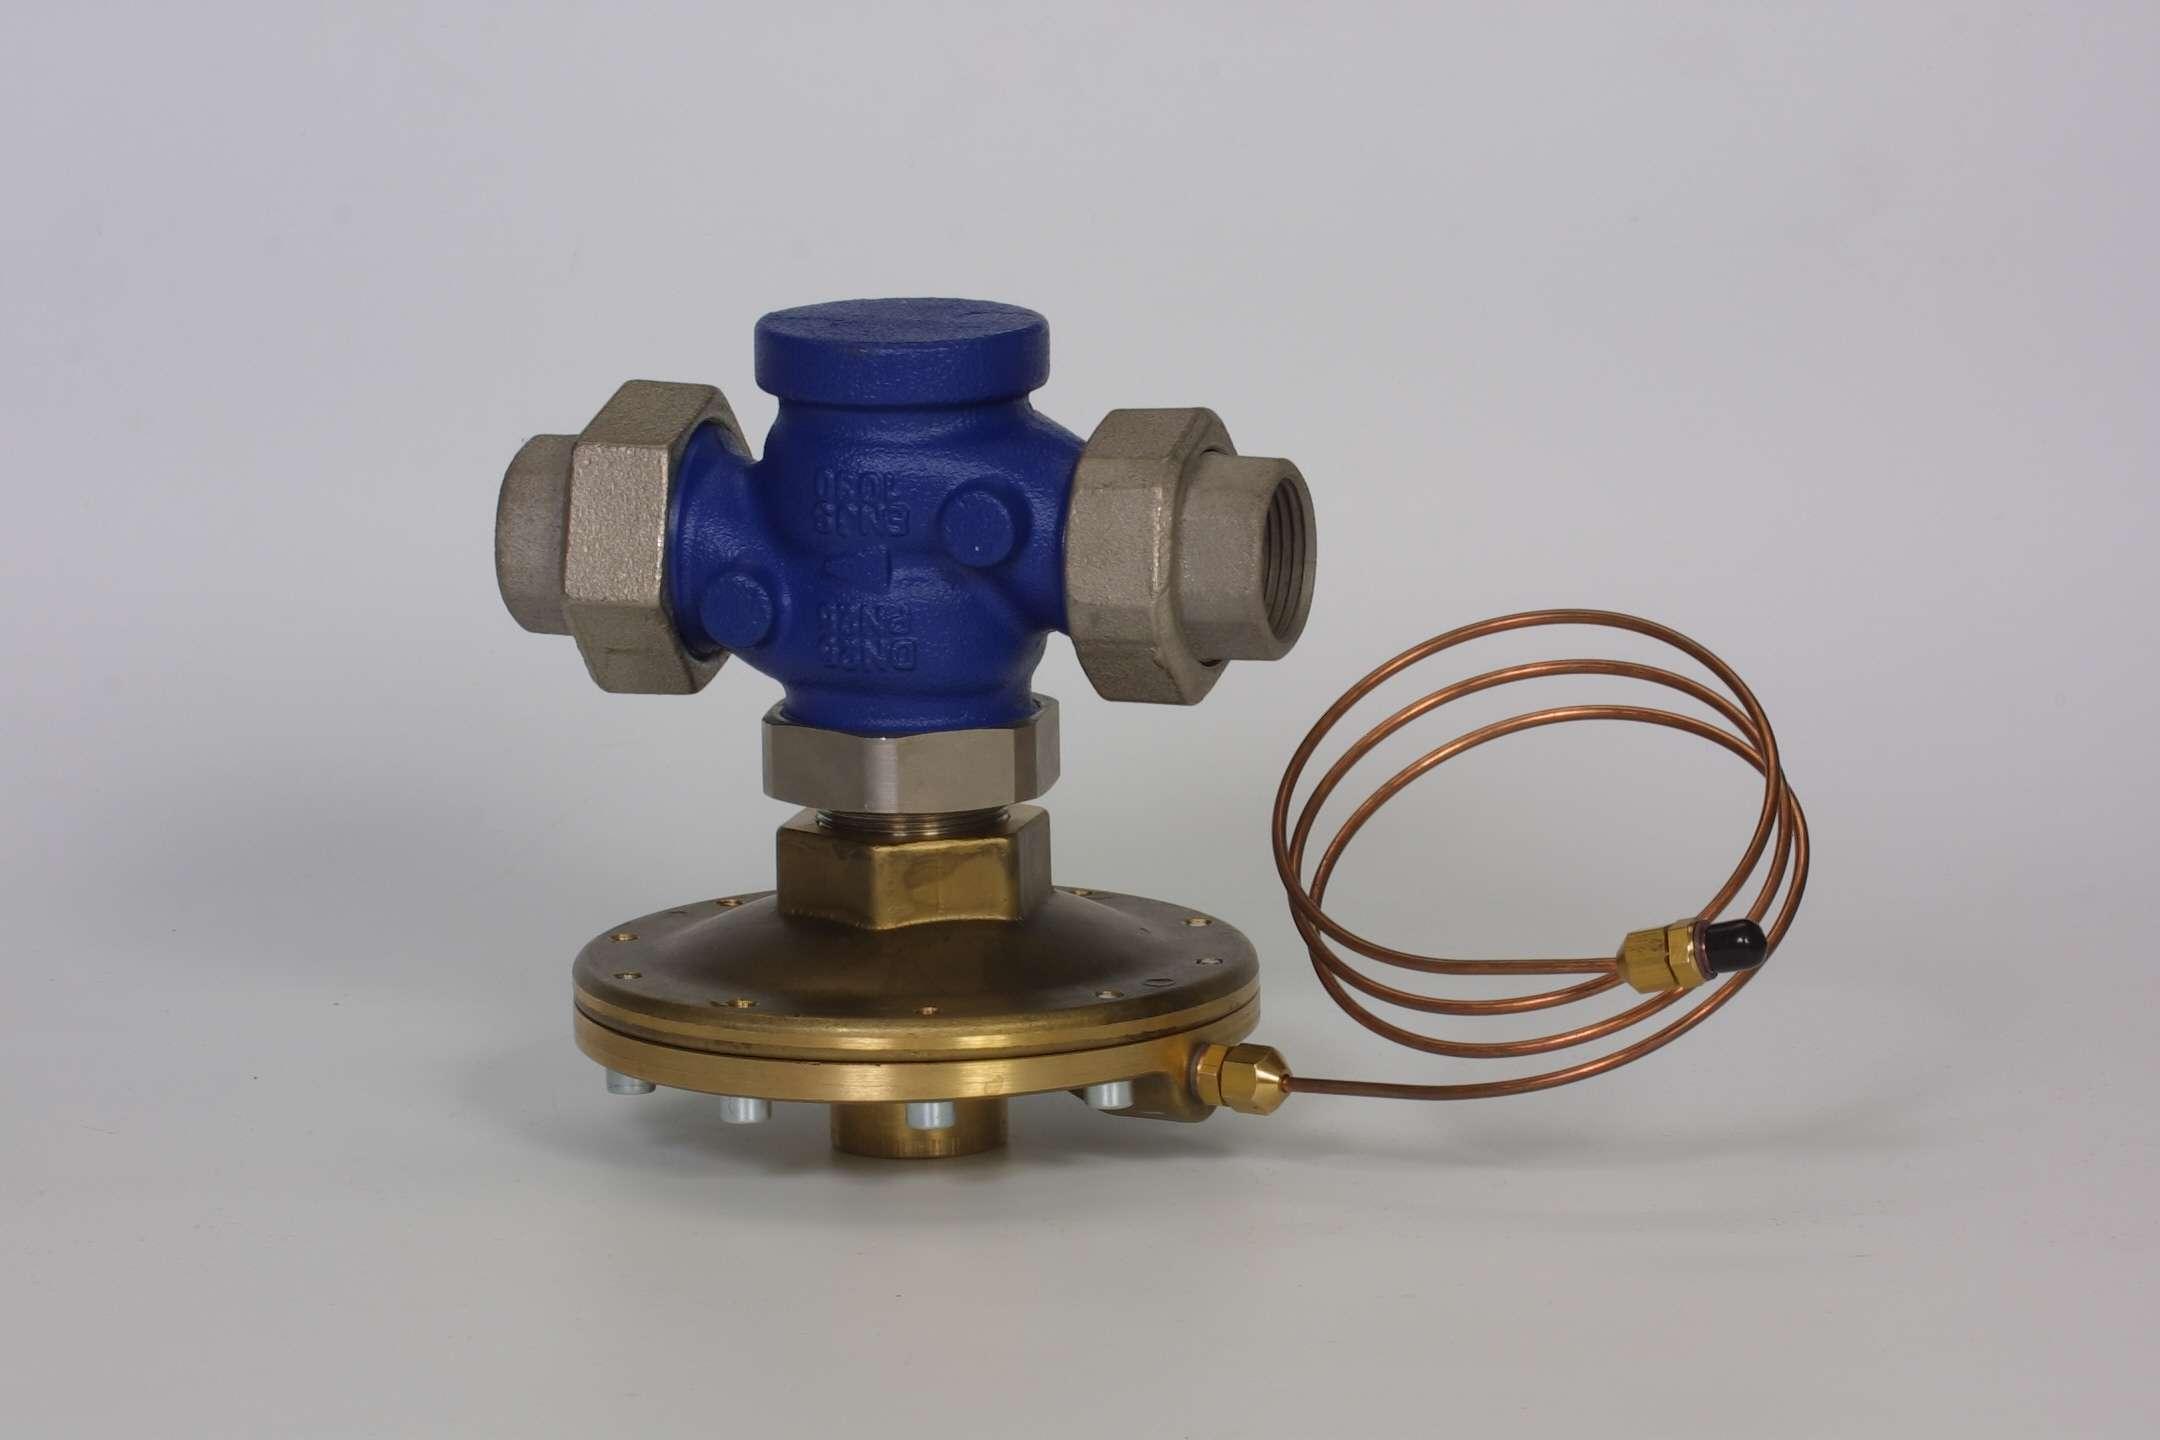 Регулятор давления РДБК1-200140ВН